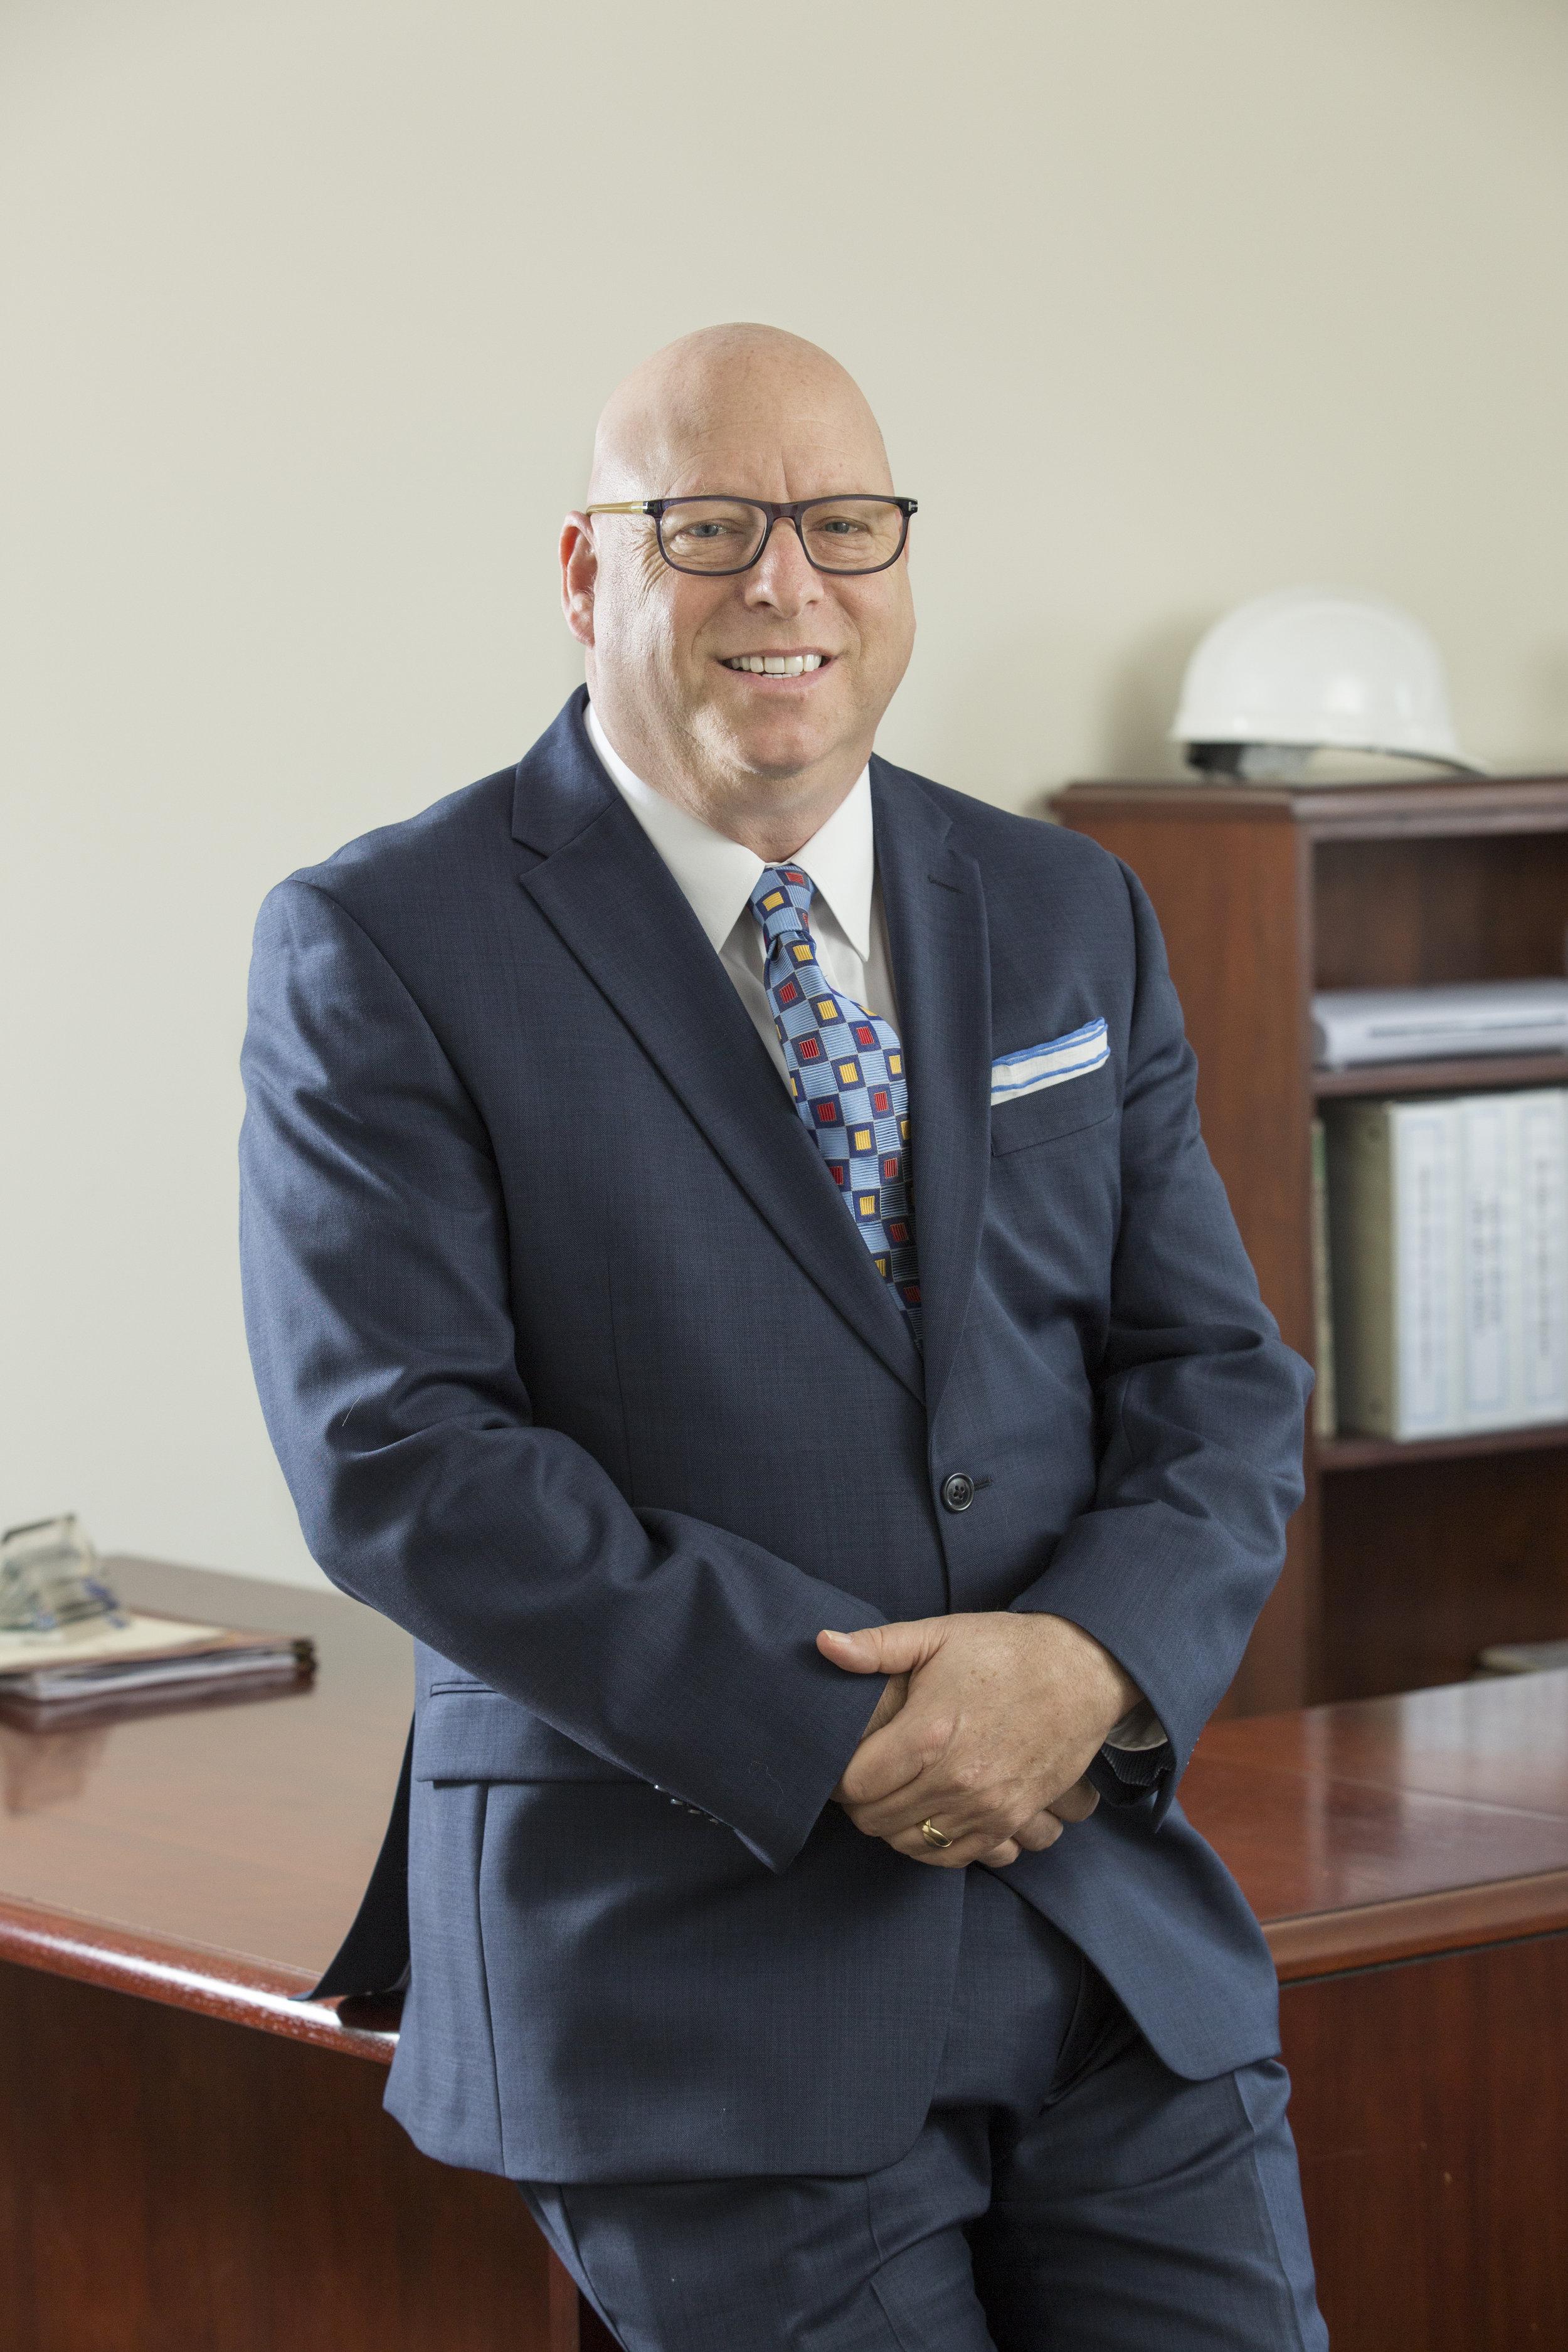 MICHAEL HORTON - Executive Vice President